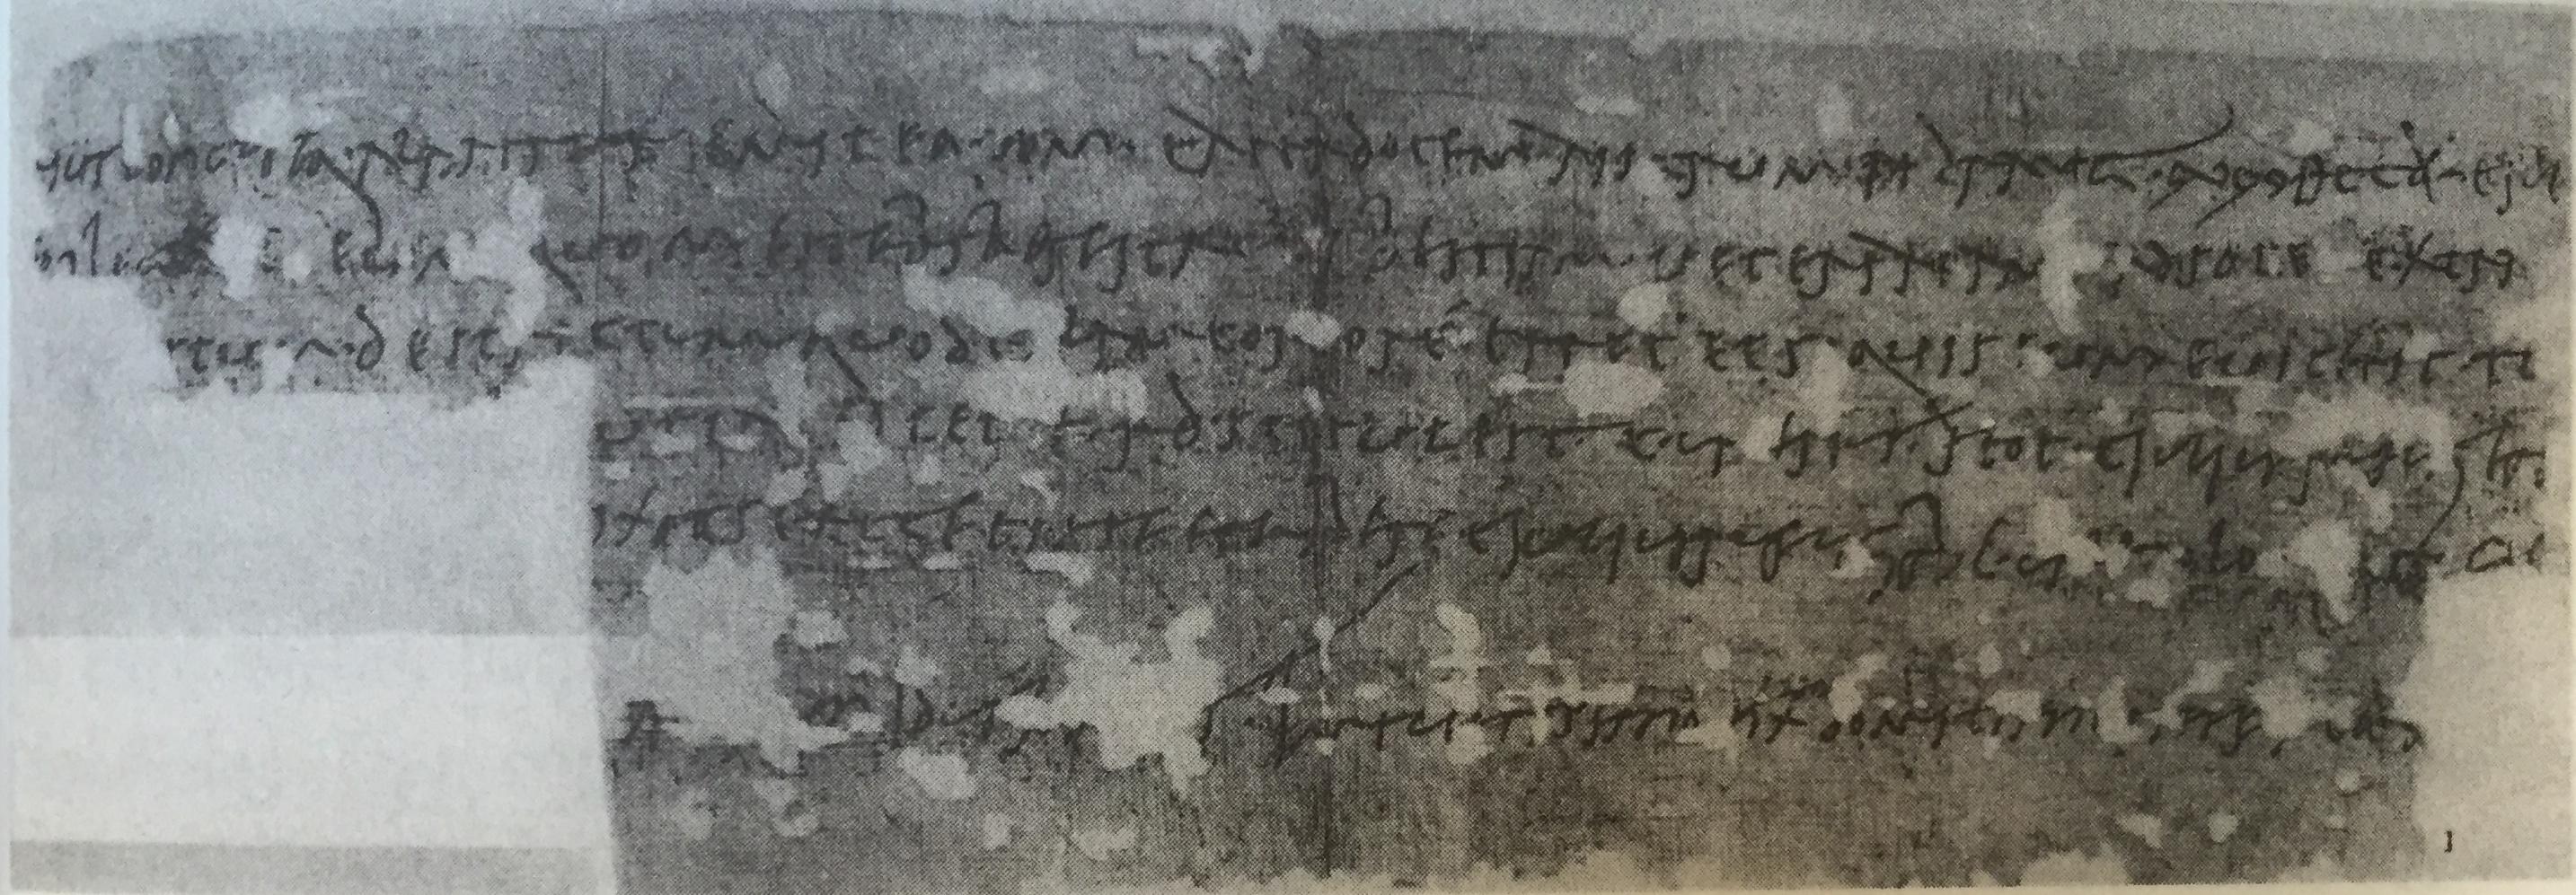 Old Roman Cursive